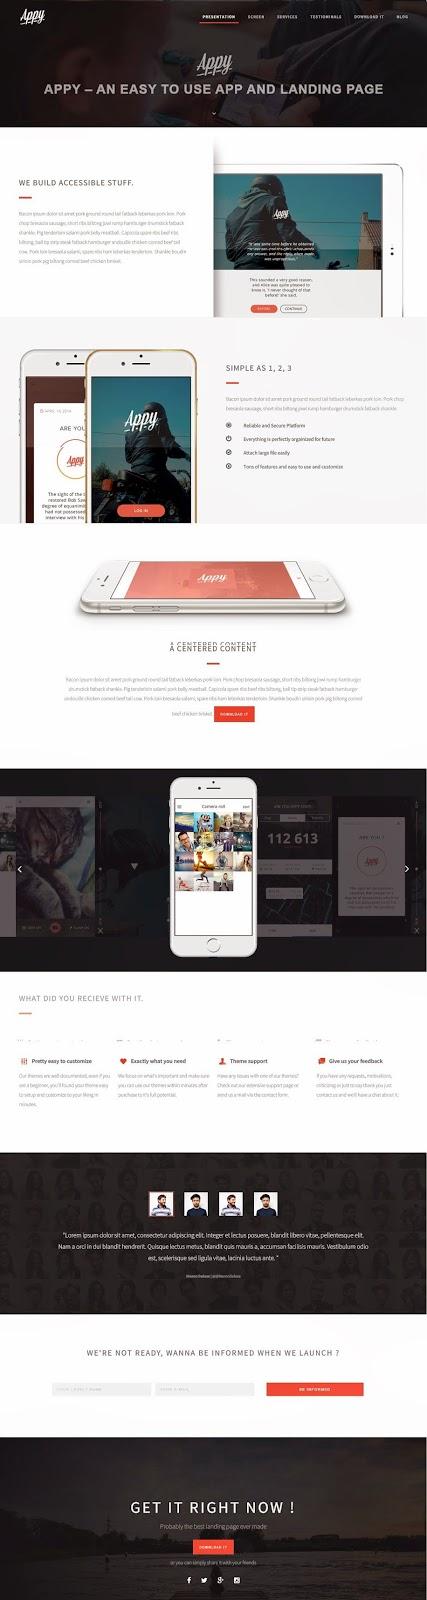 Premium App Landing Page Template 2015